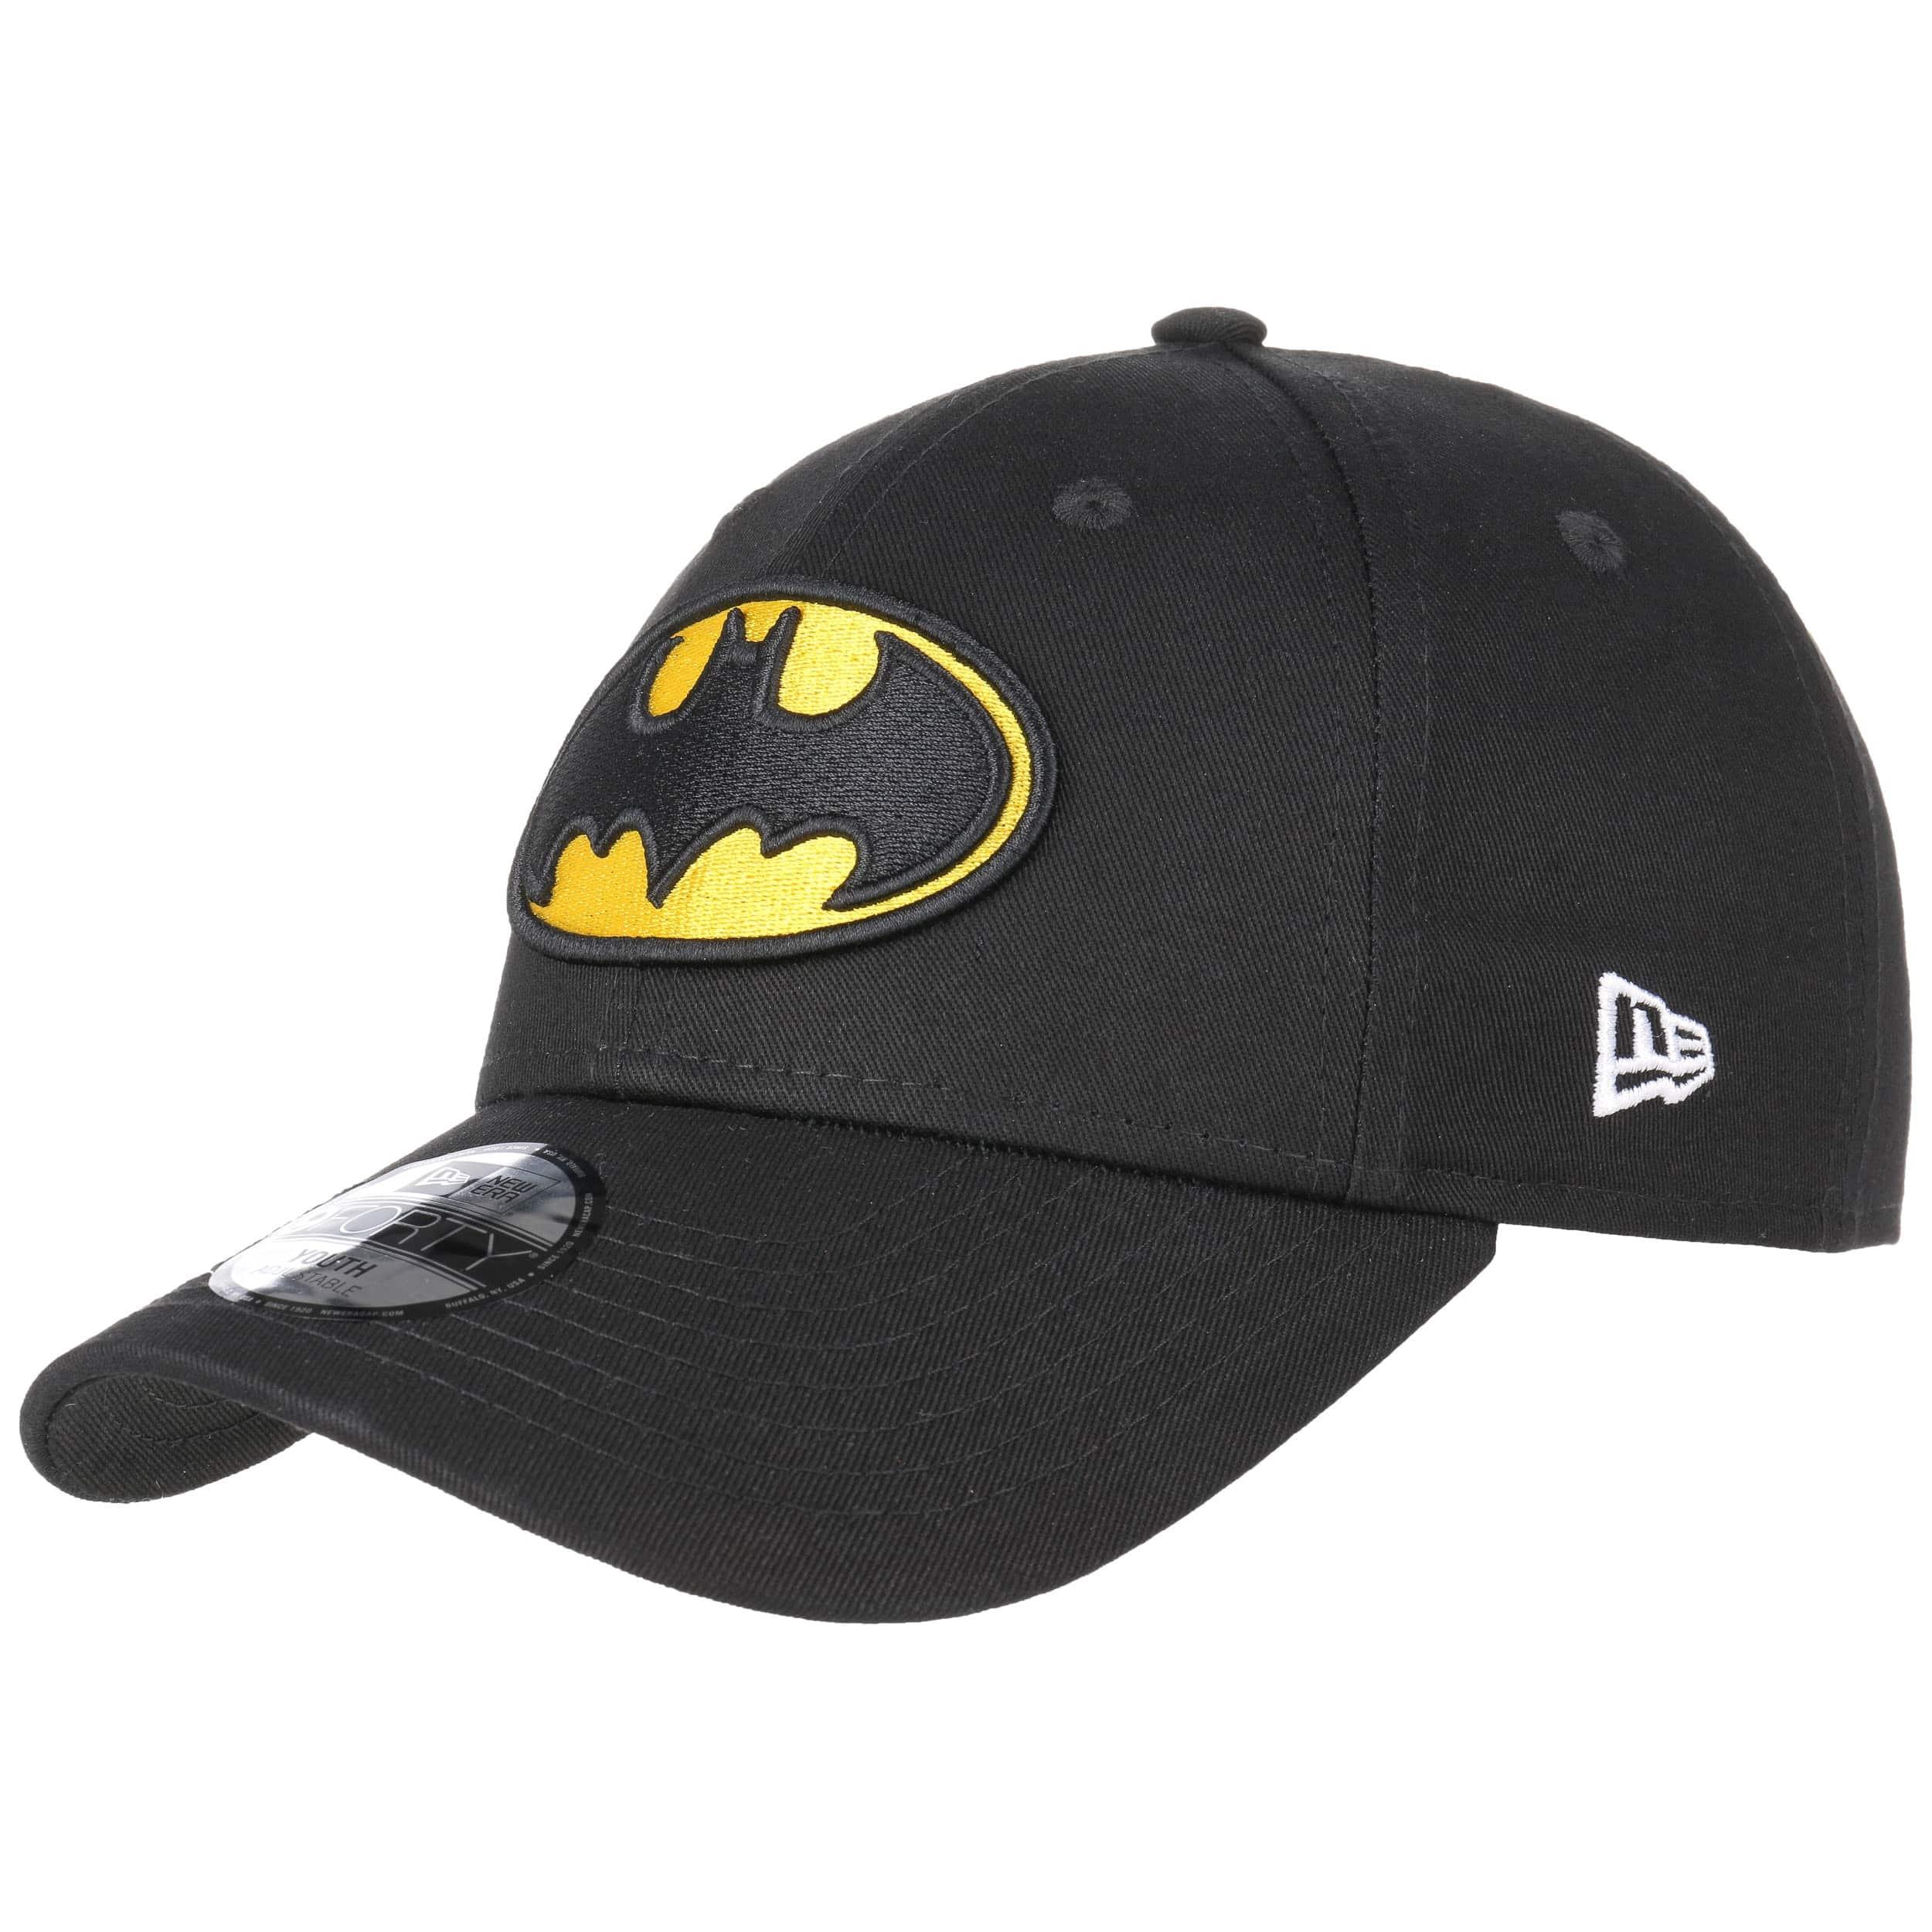 big sale 6cd1e d60da 88 batman youth 39thirty hat 6ac83 04d4d  discount 9forty kids ess batman  cap by new era 6 1cc34 14515